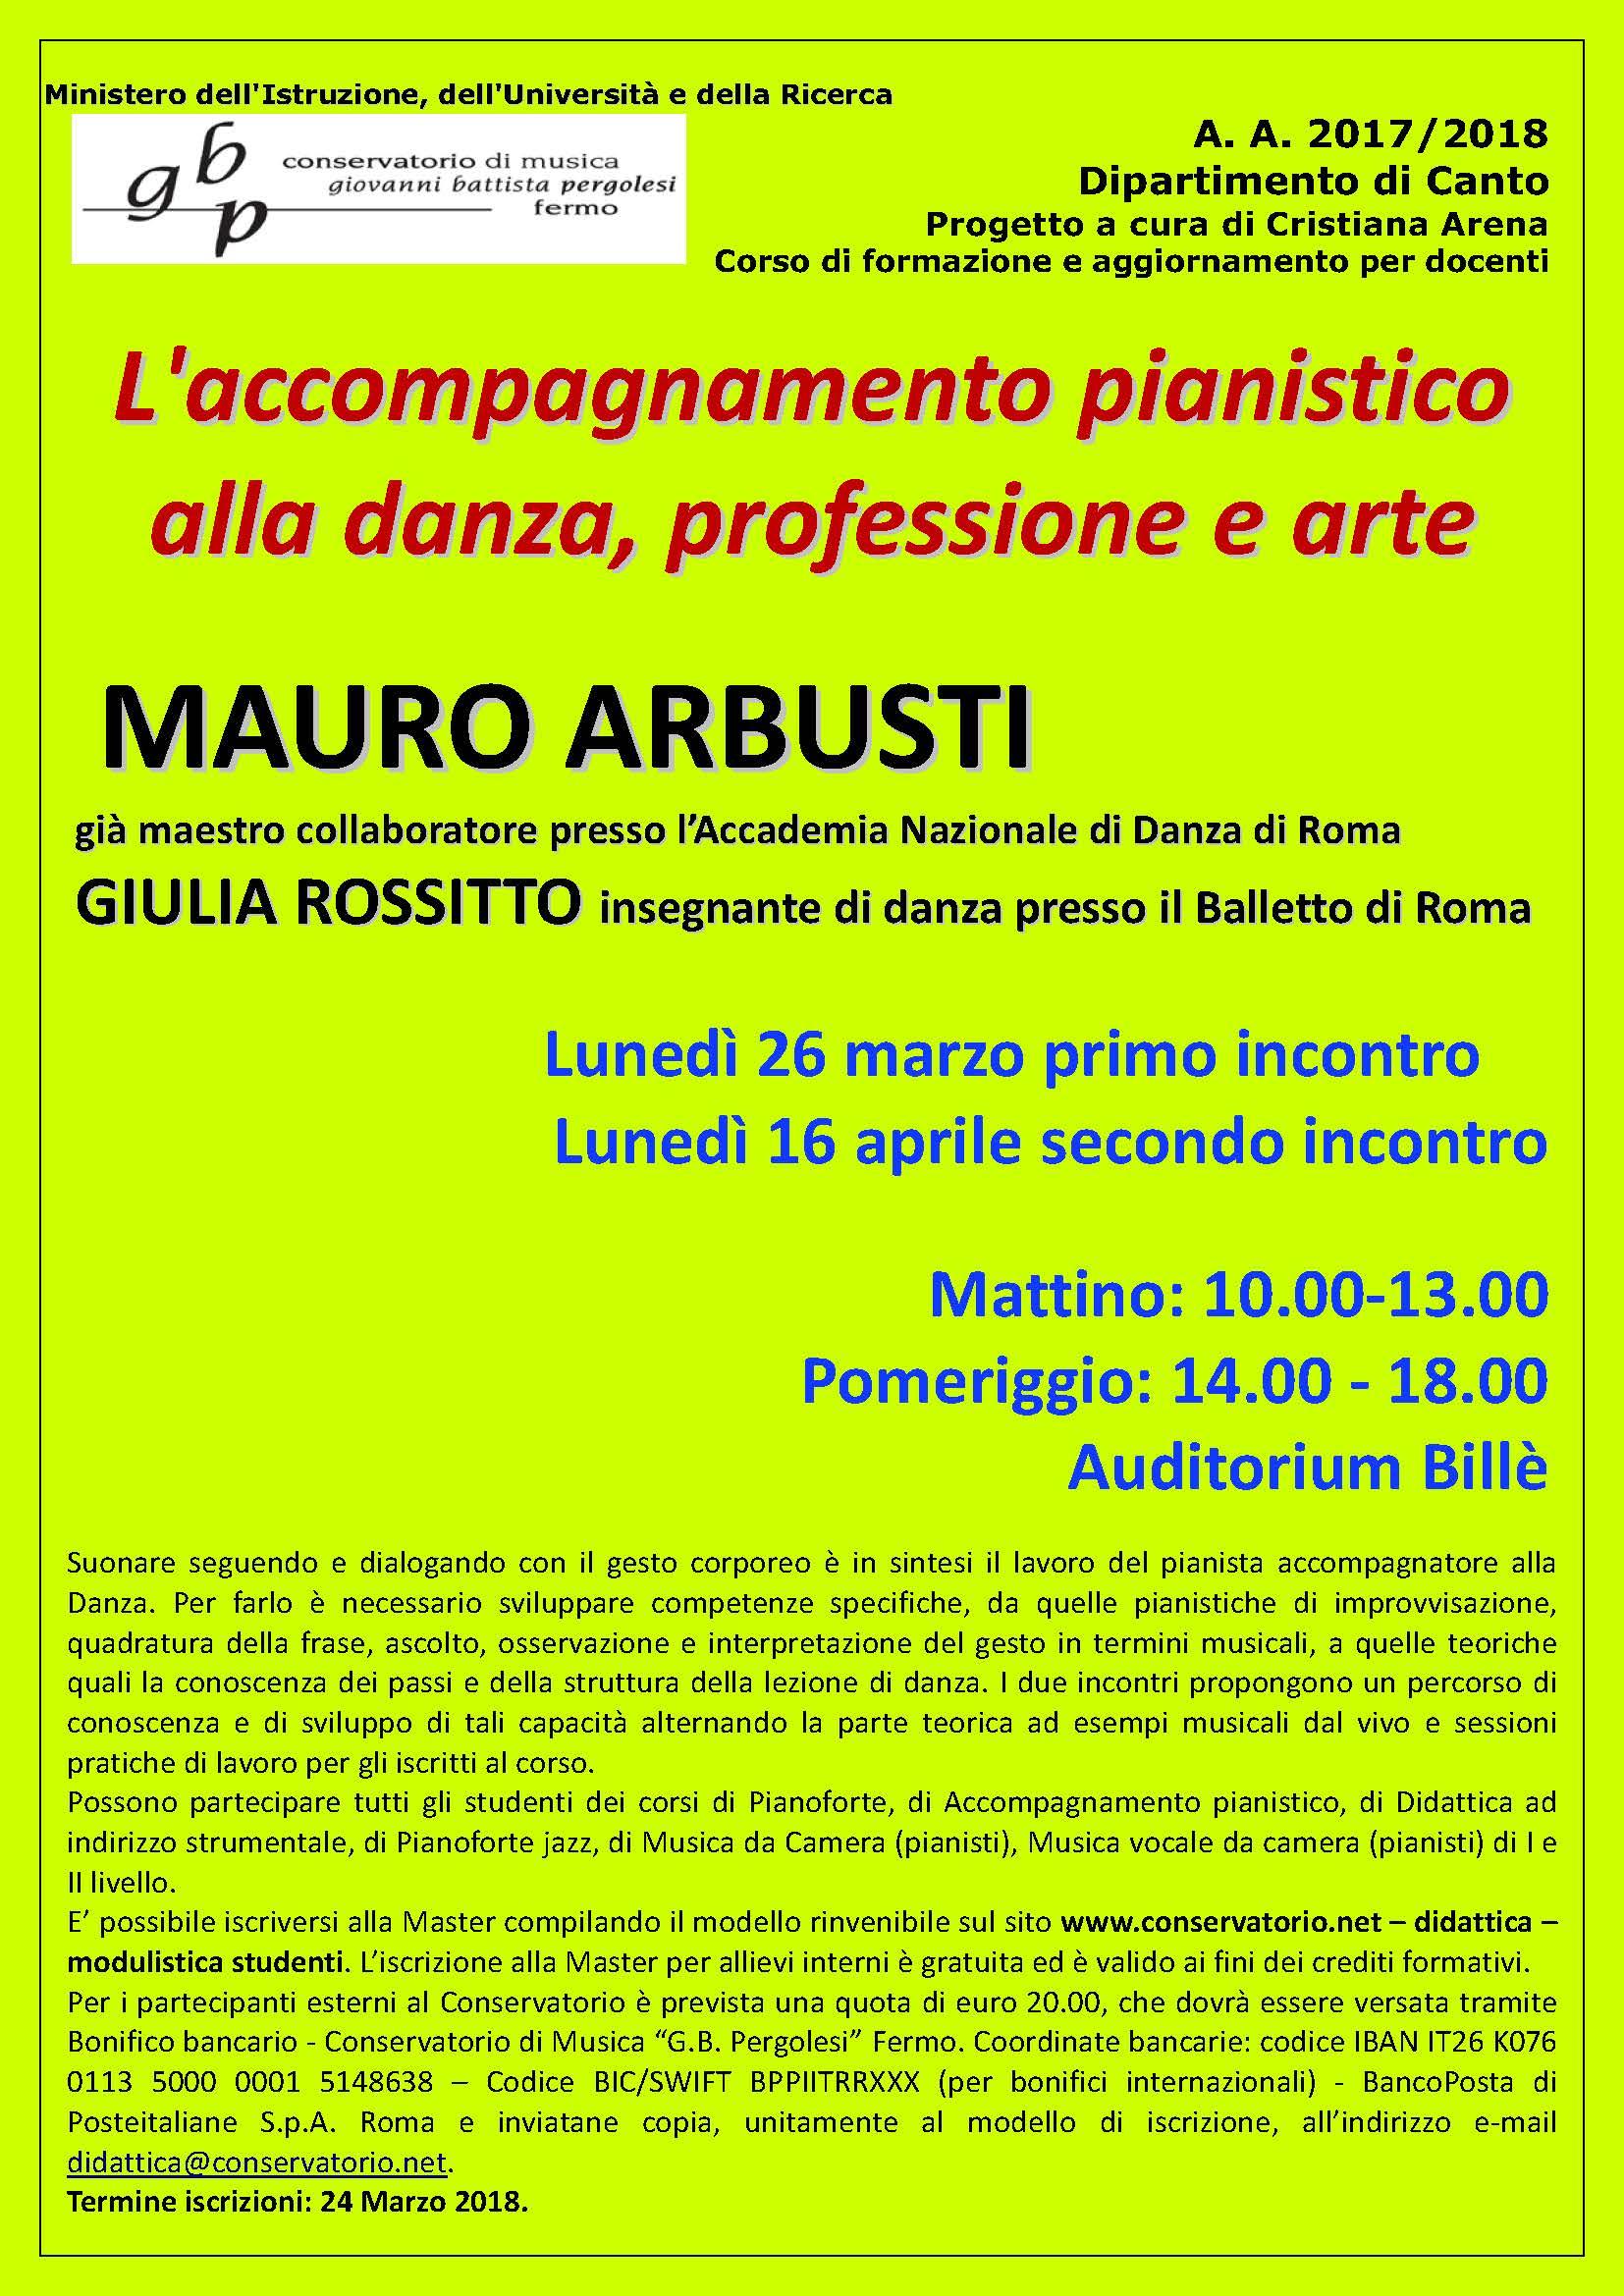 Locandina Seminario ARBUSTI - 2018